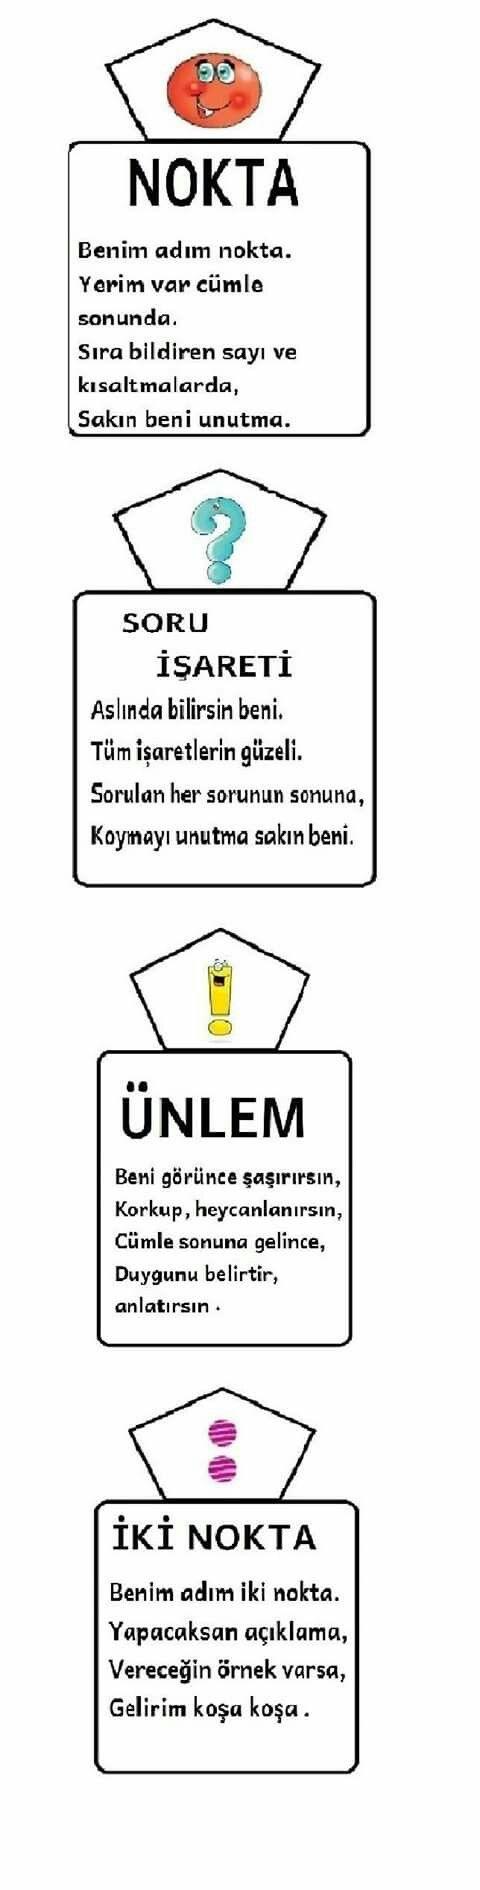 Noktalama işaretleri 1 Eğitim #Education http://turkrazzi.com/ppost/355362226837285089/